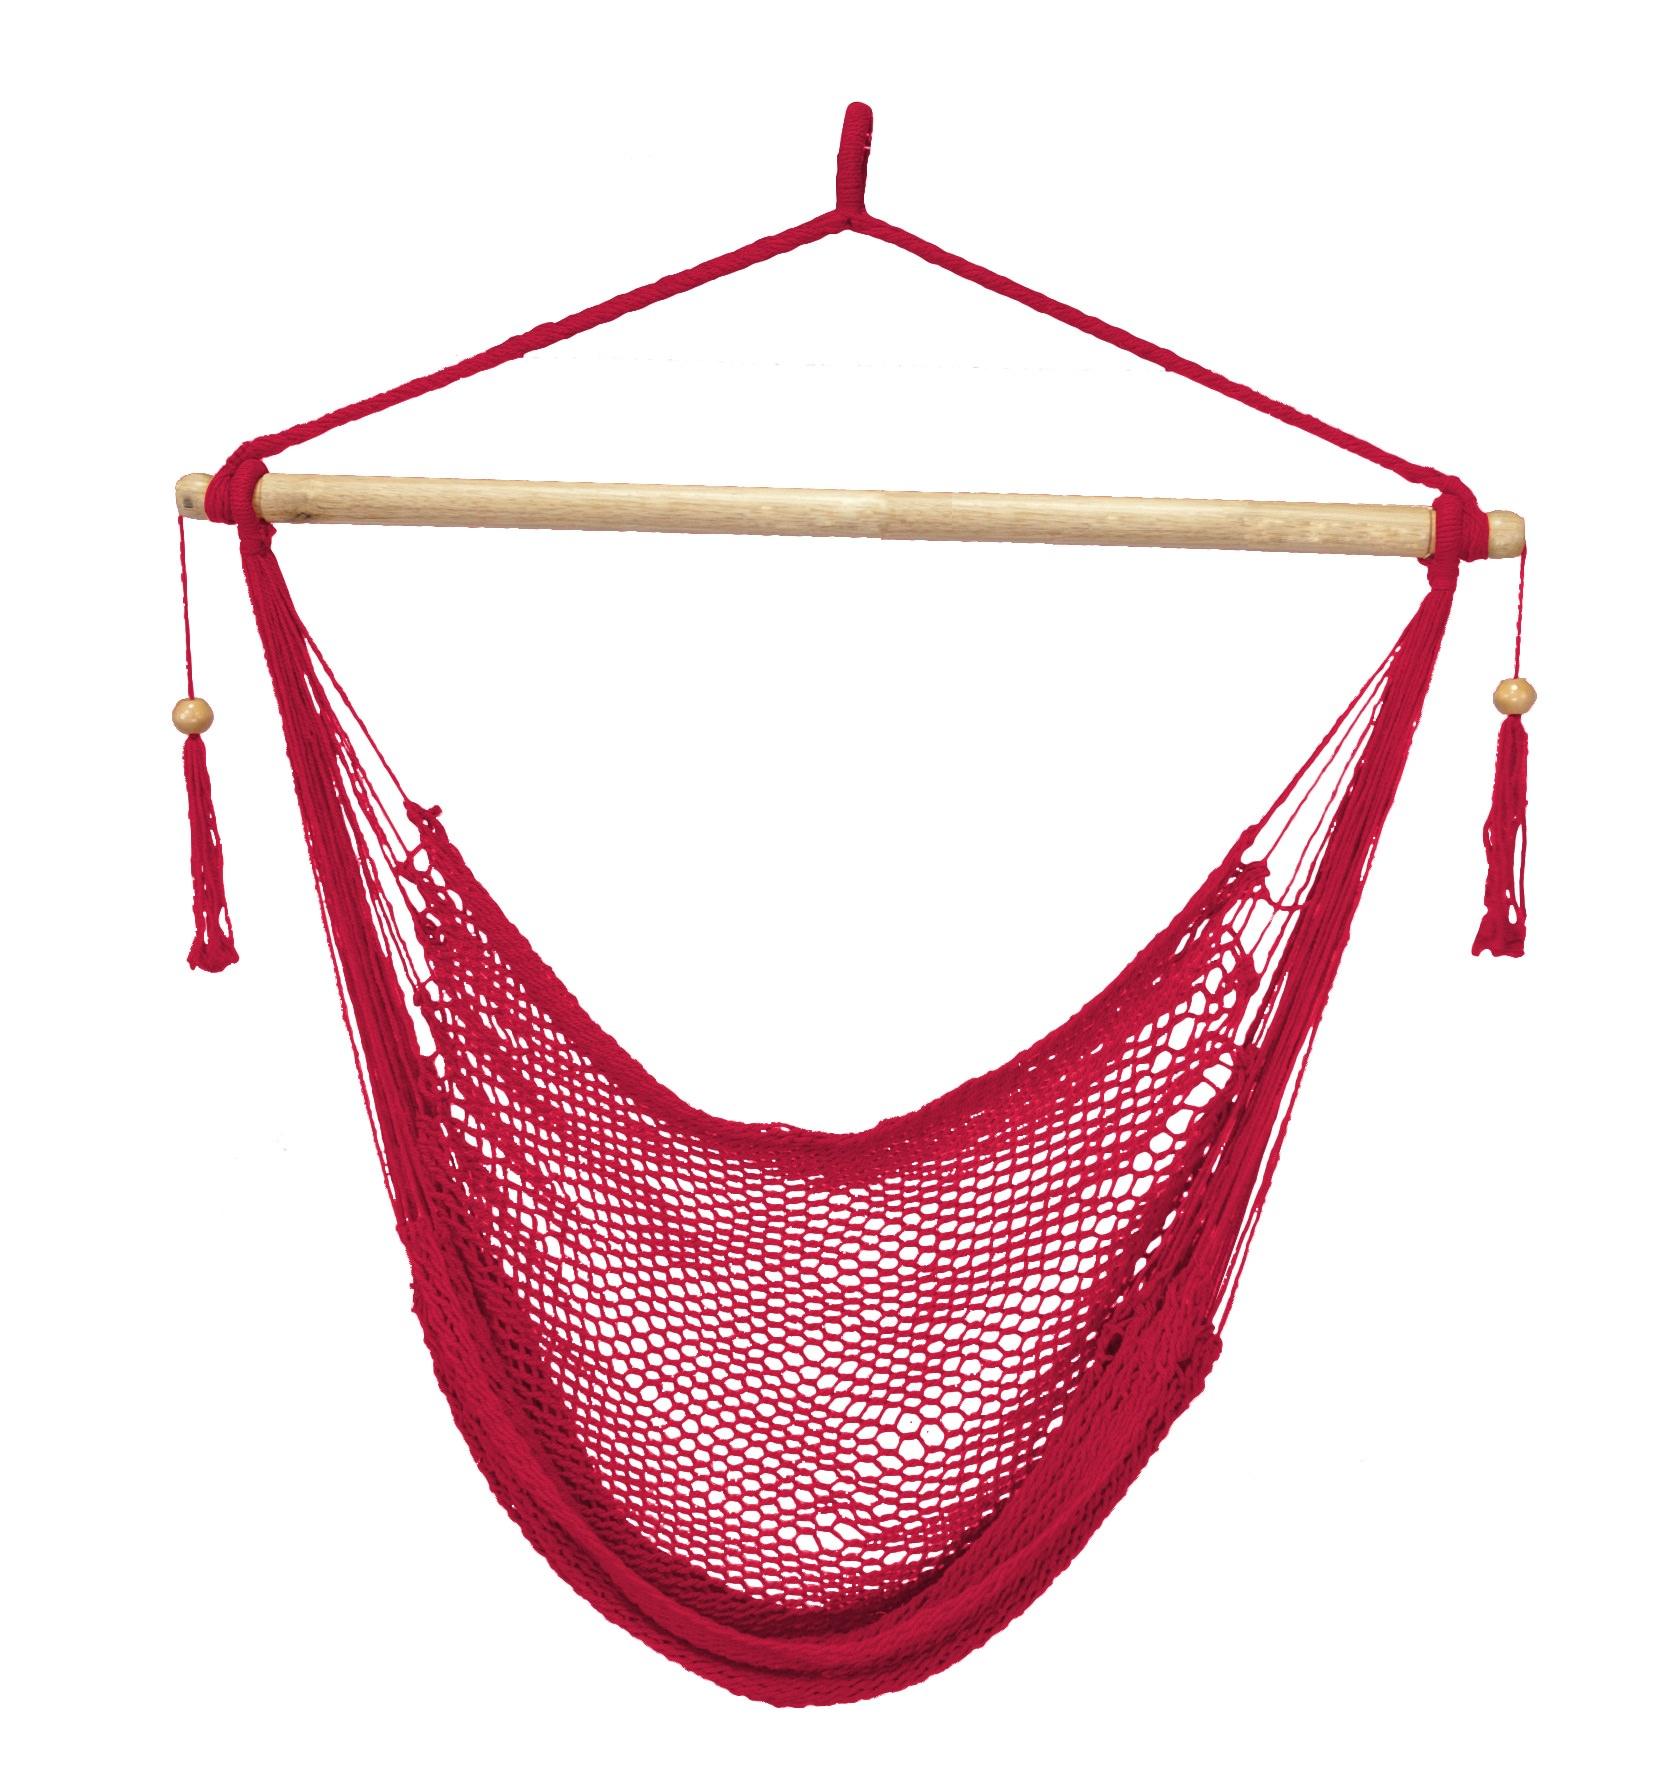 Island Paradise Rope Hammock Chair - Red